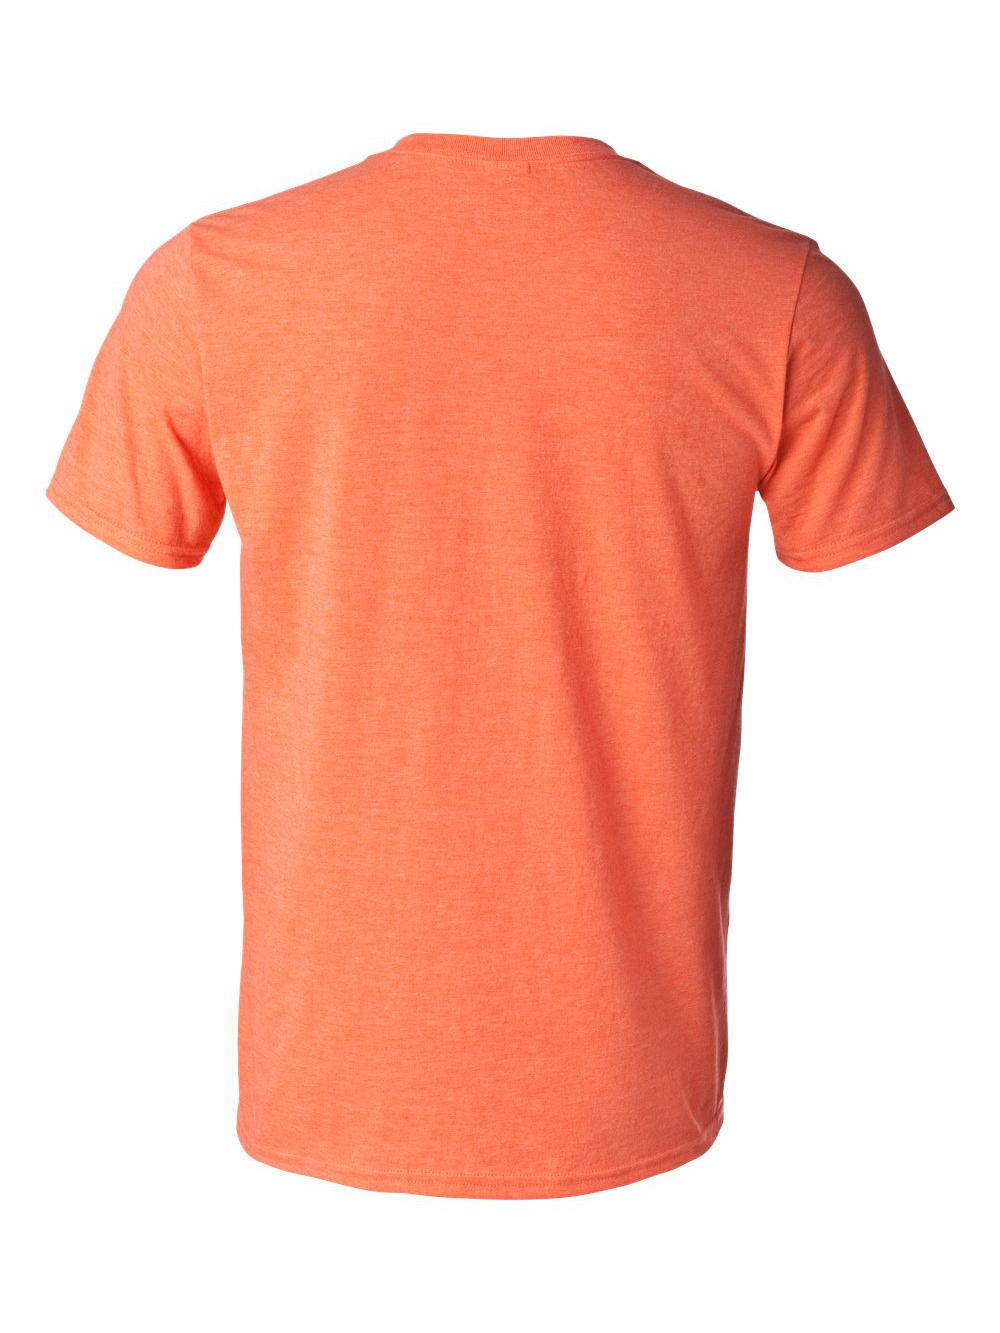 Gildan-Softstyle-T-Shirt-64000 thumbnail 85